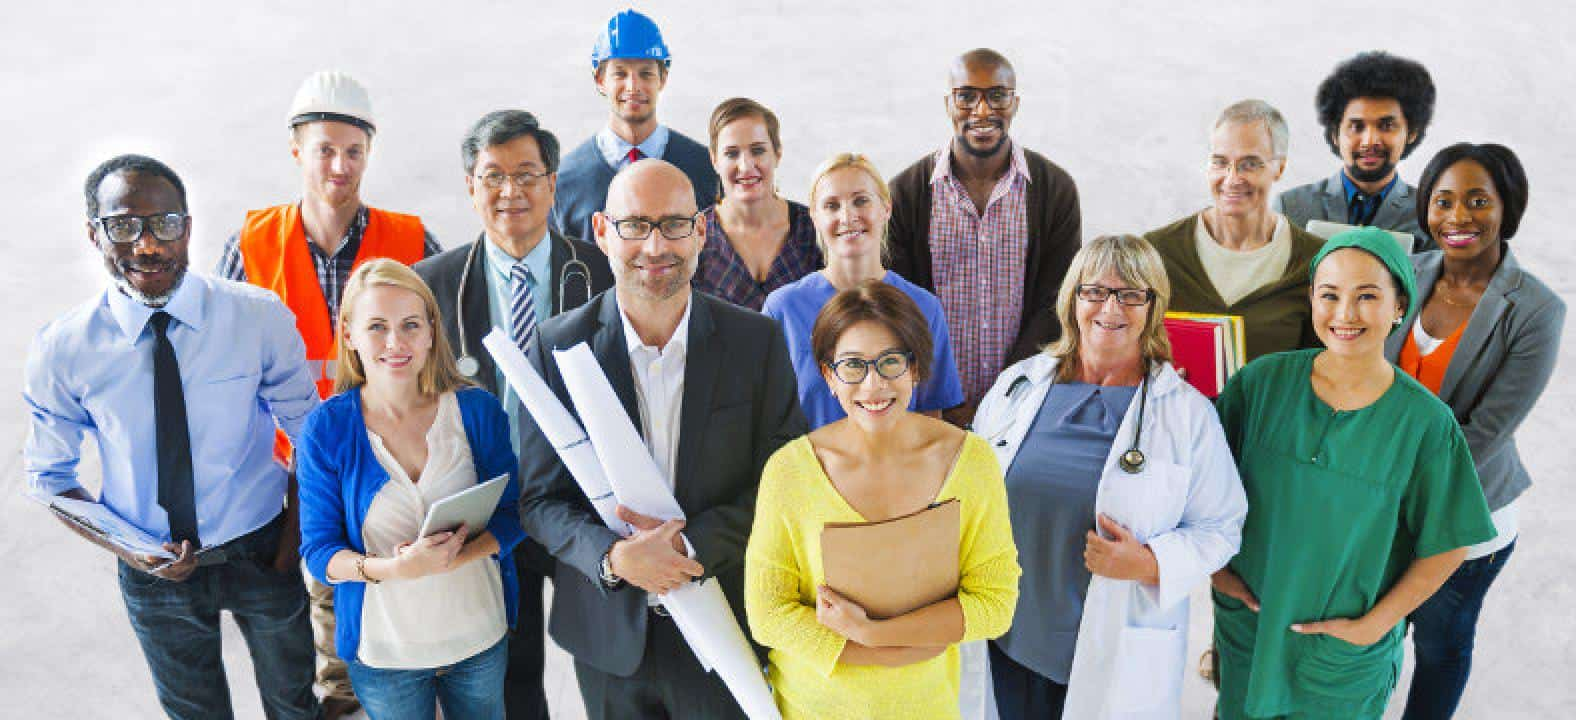 London Workforce Demand for Professionals Increasing